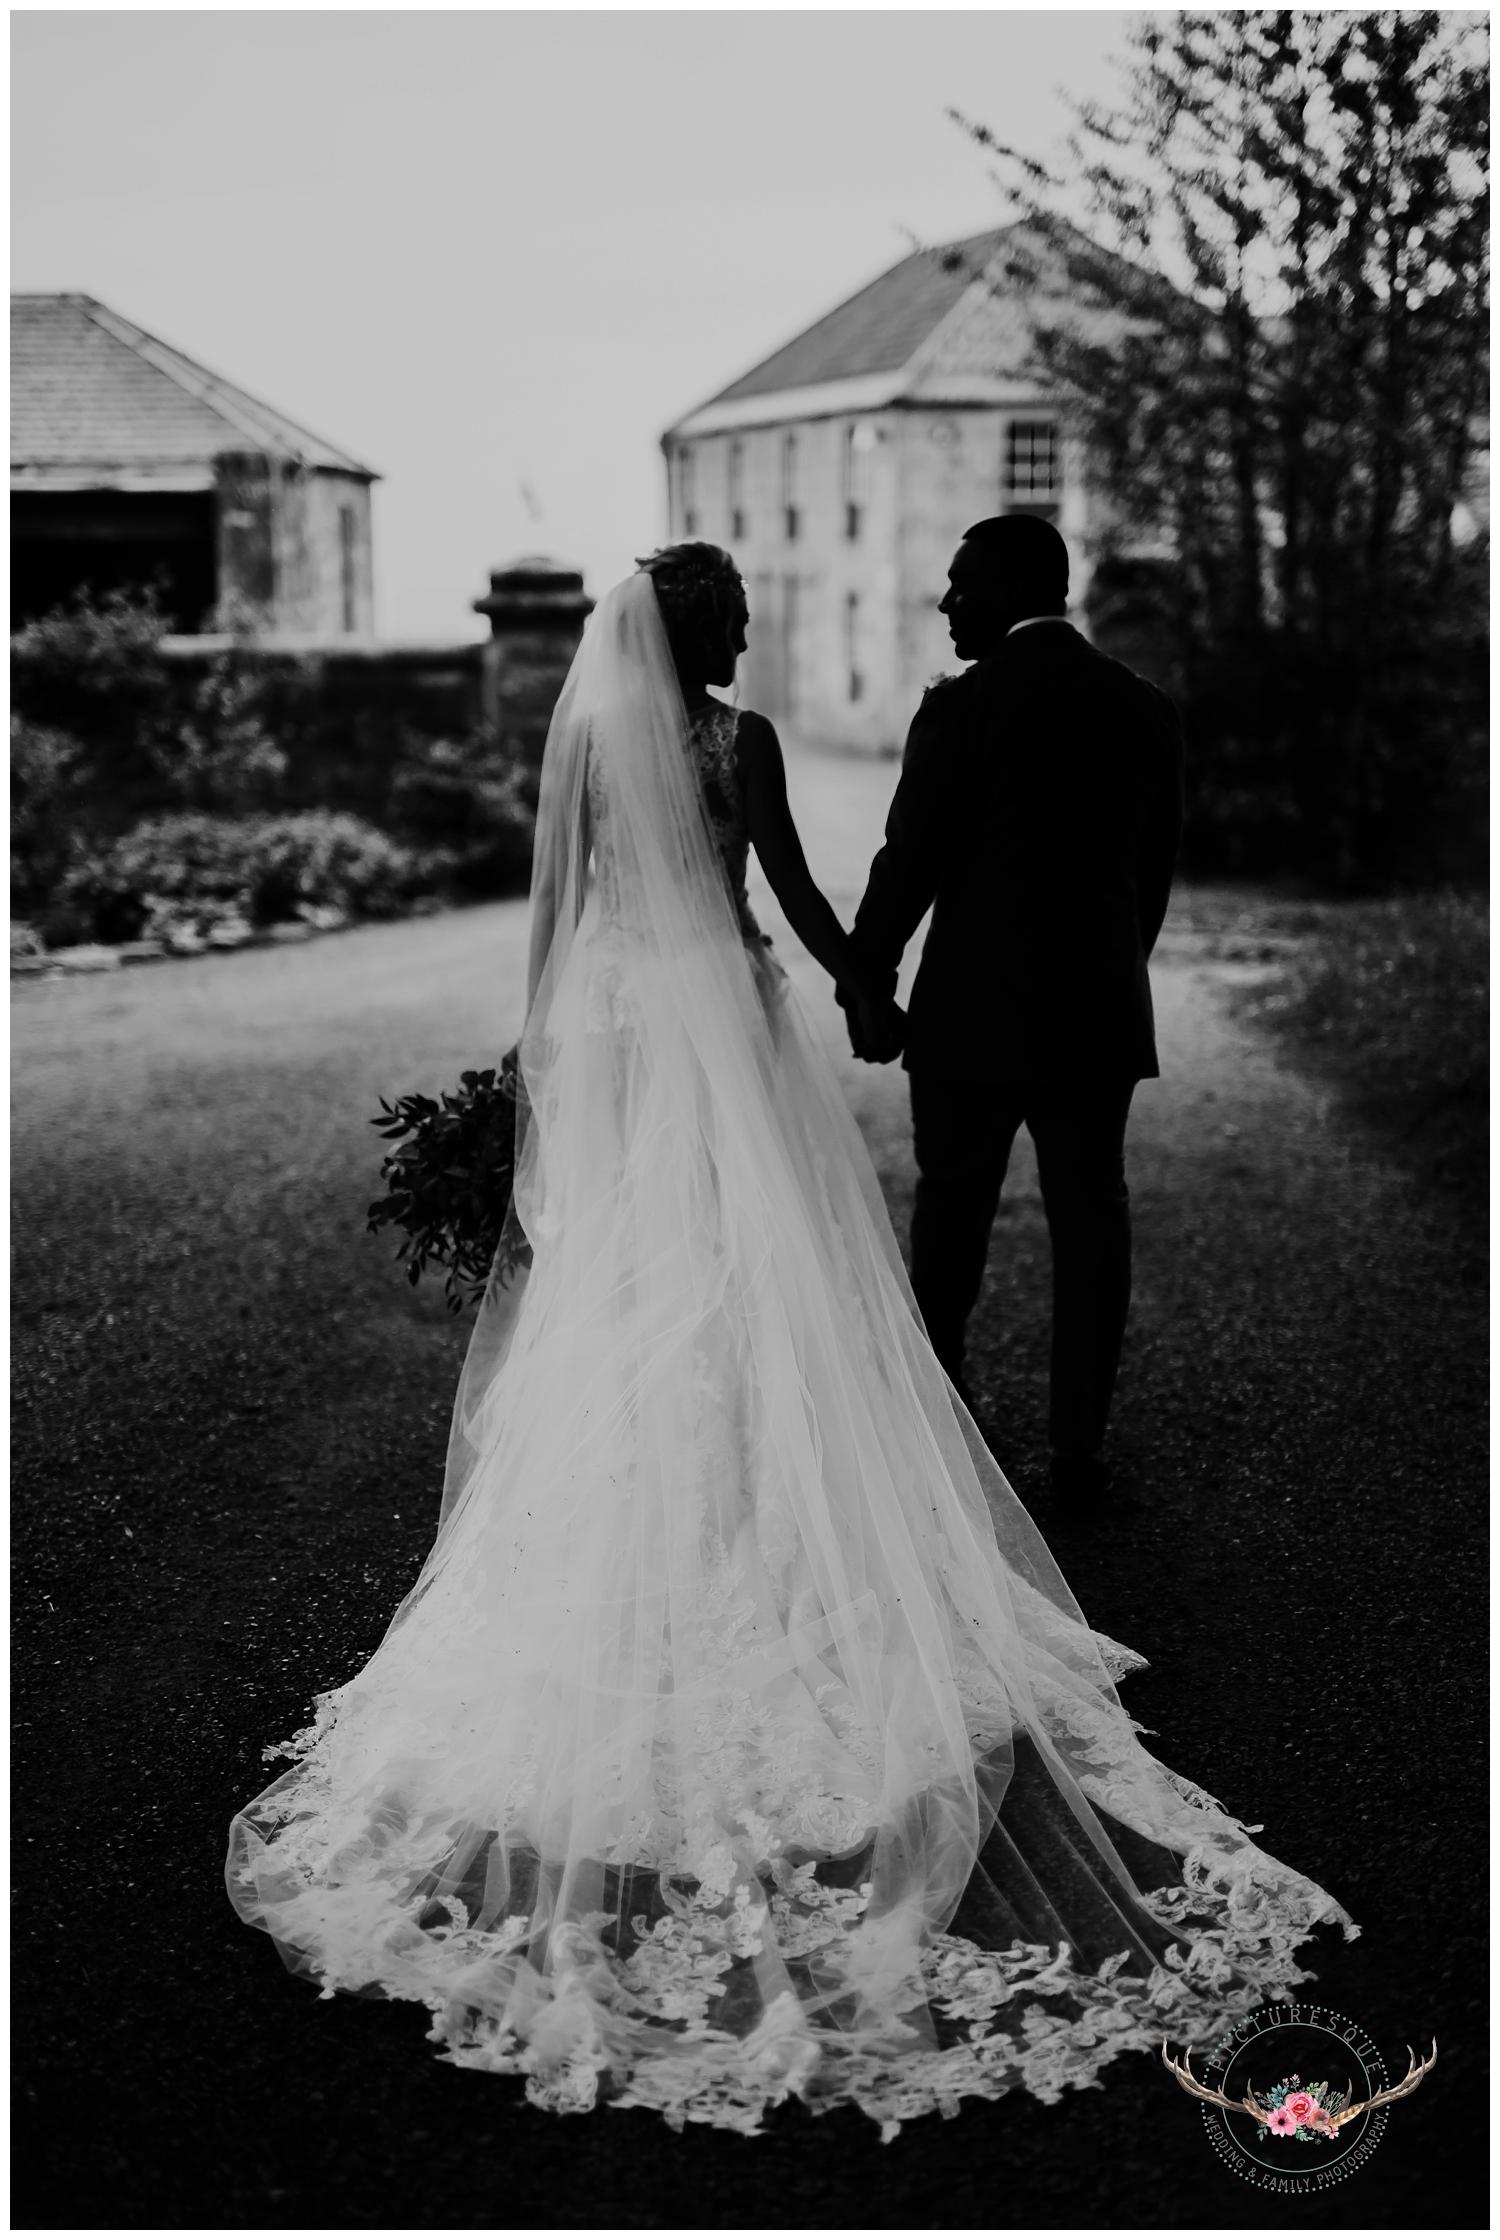 Kinkell Byre, Scottish wedding, Picturesque, WeddingPhotography, Scotland_0063.jpg